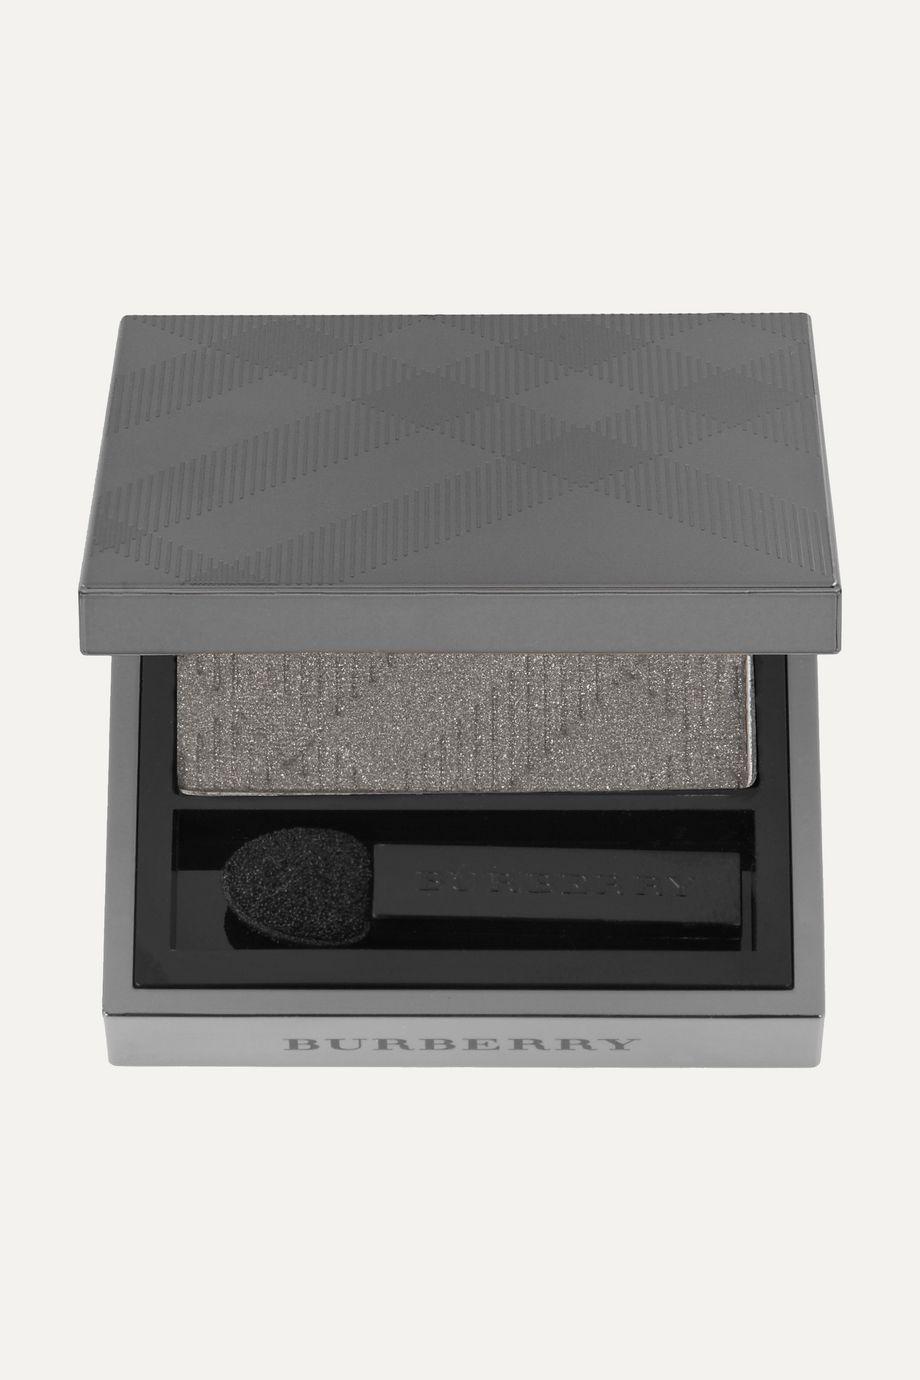 Burberry Beauty Wet & Dry Silk Eye Shadow - Nickel No.304